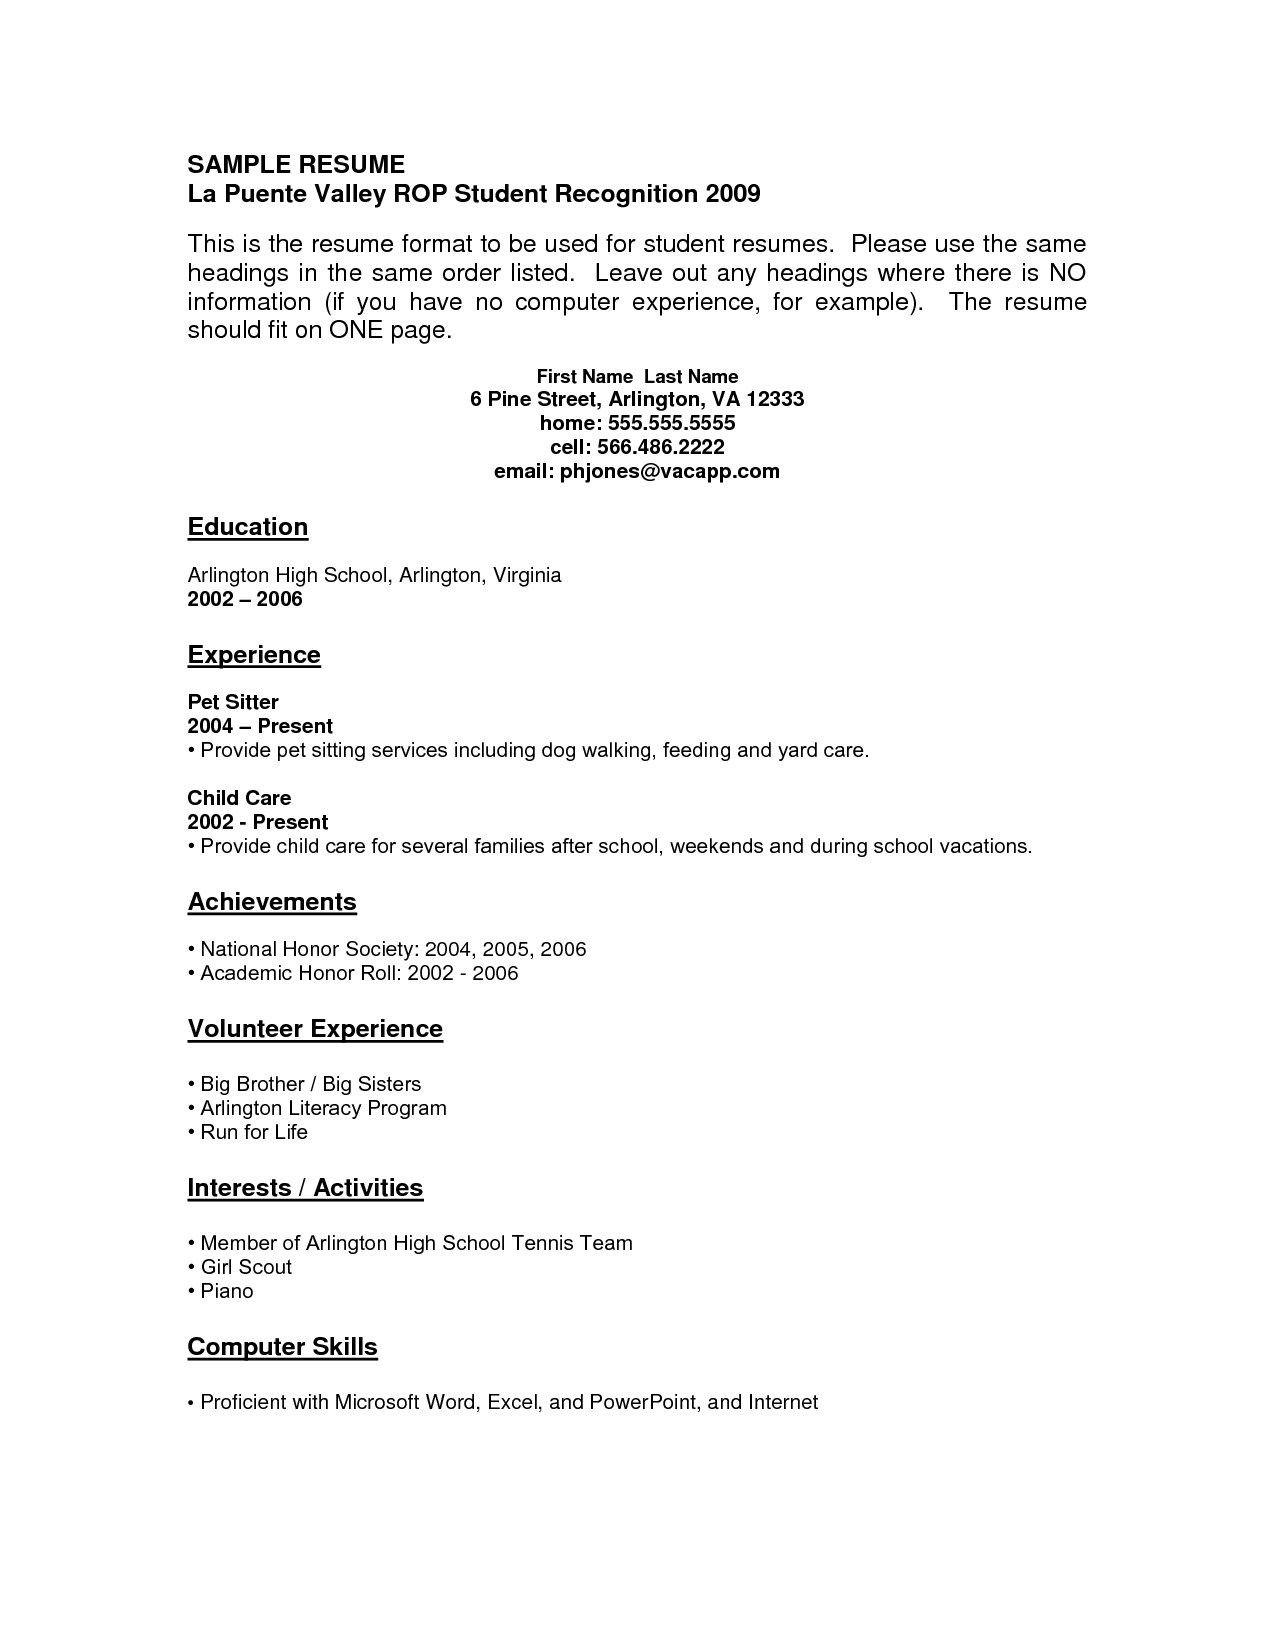 Sample Resume for High School Student No Experience Resume Examples with No Job Experience – Resume Templates Job …